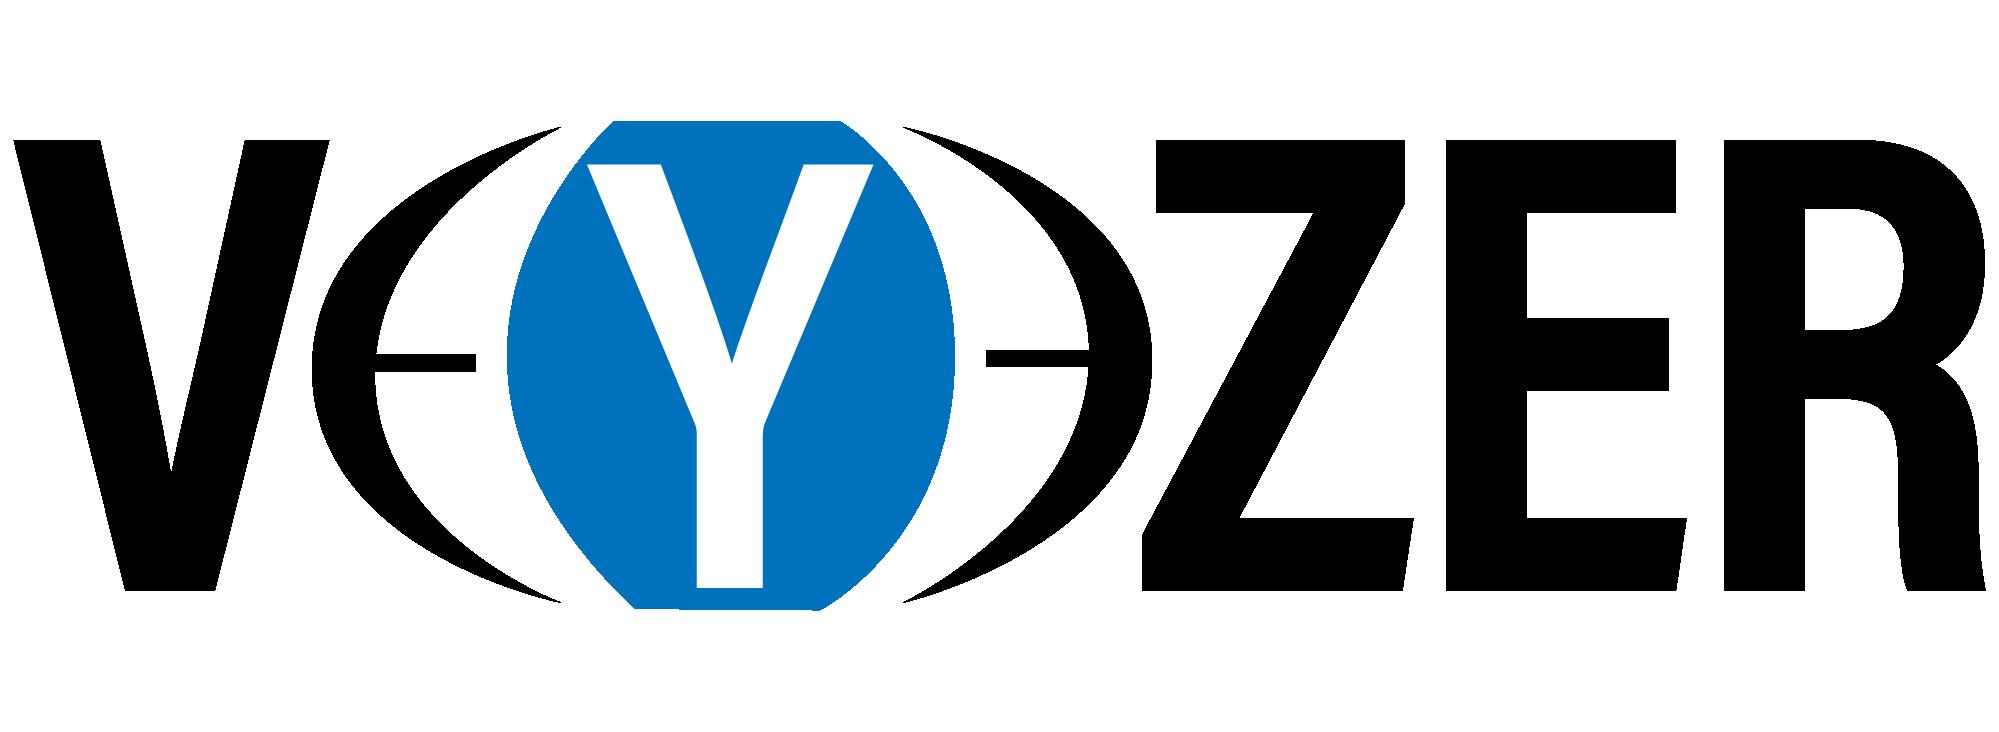 VeyeZER™